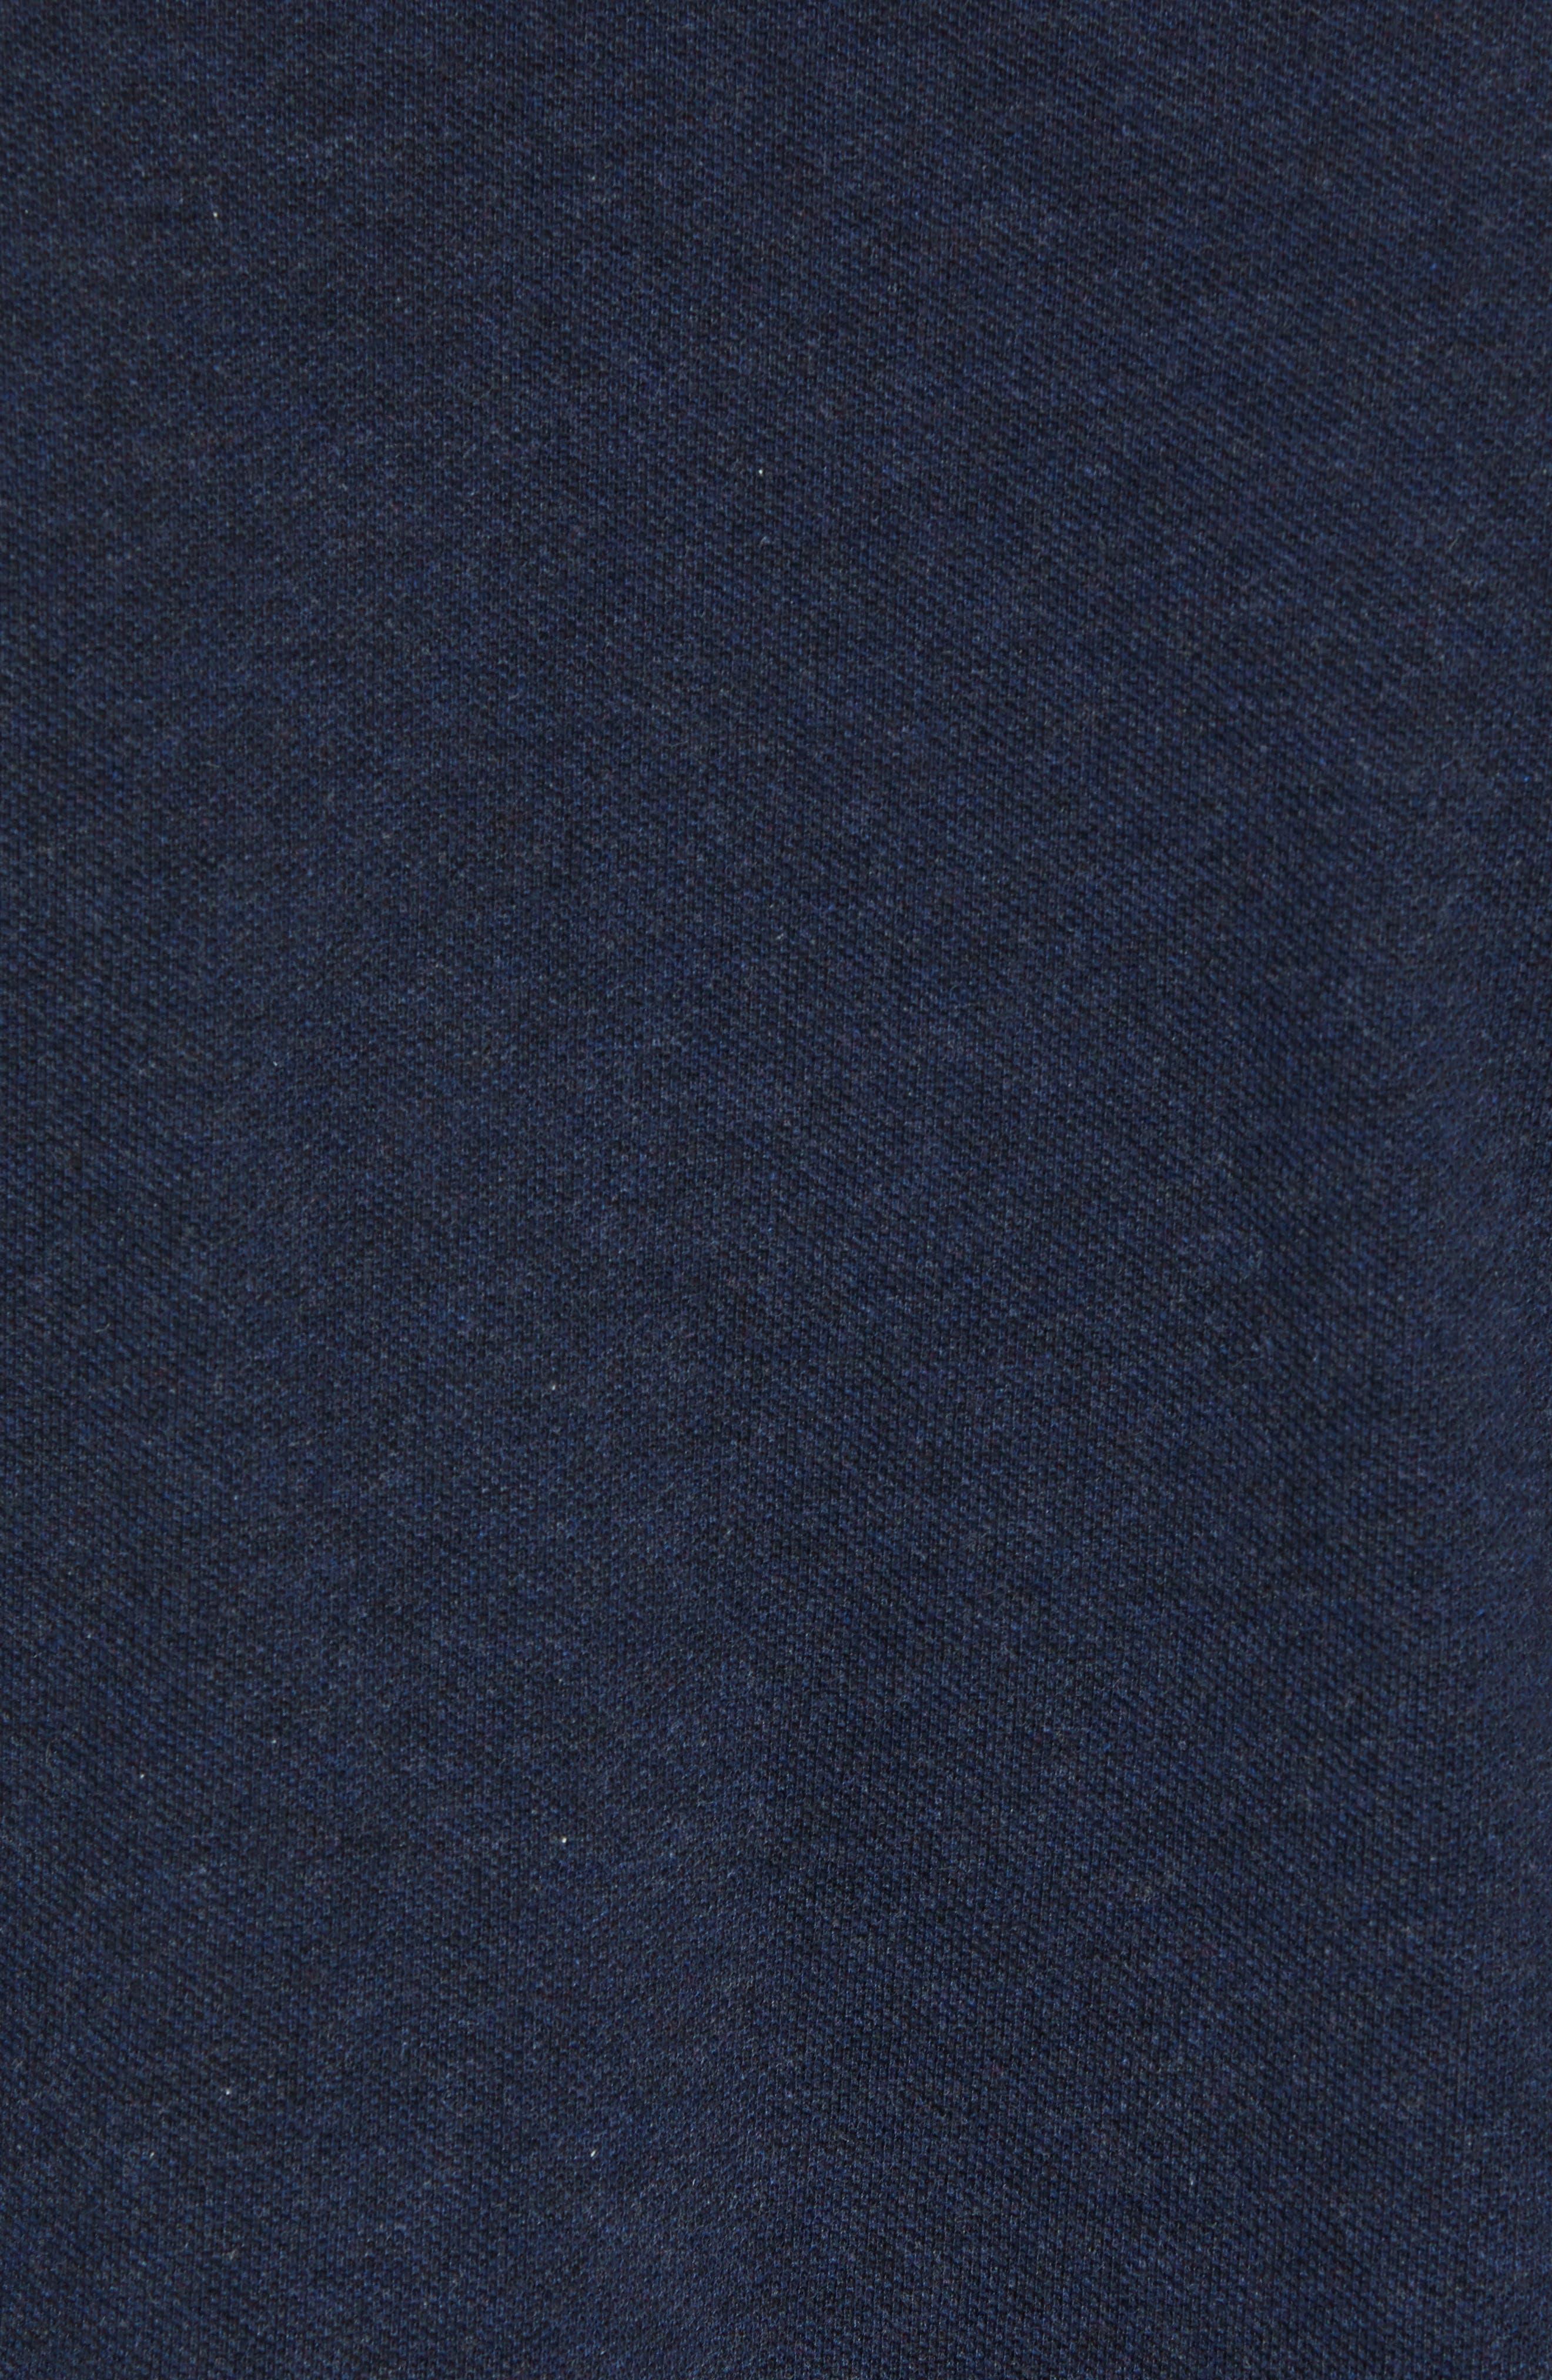 LACOSTE, Long Sleeve Piqué Polo, Alternate thumbnail 5, color, ECLIPSE BLUE CHINE